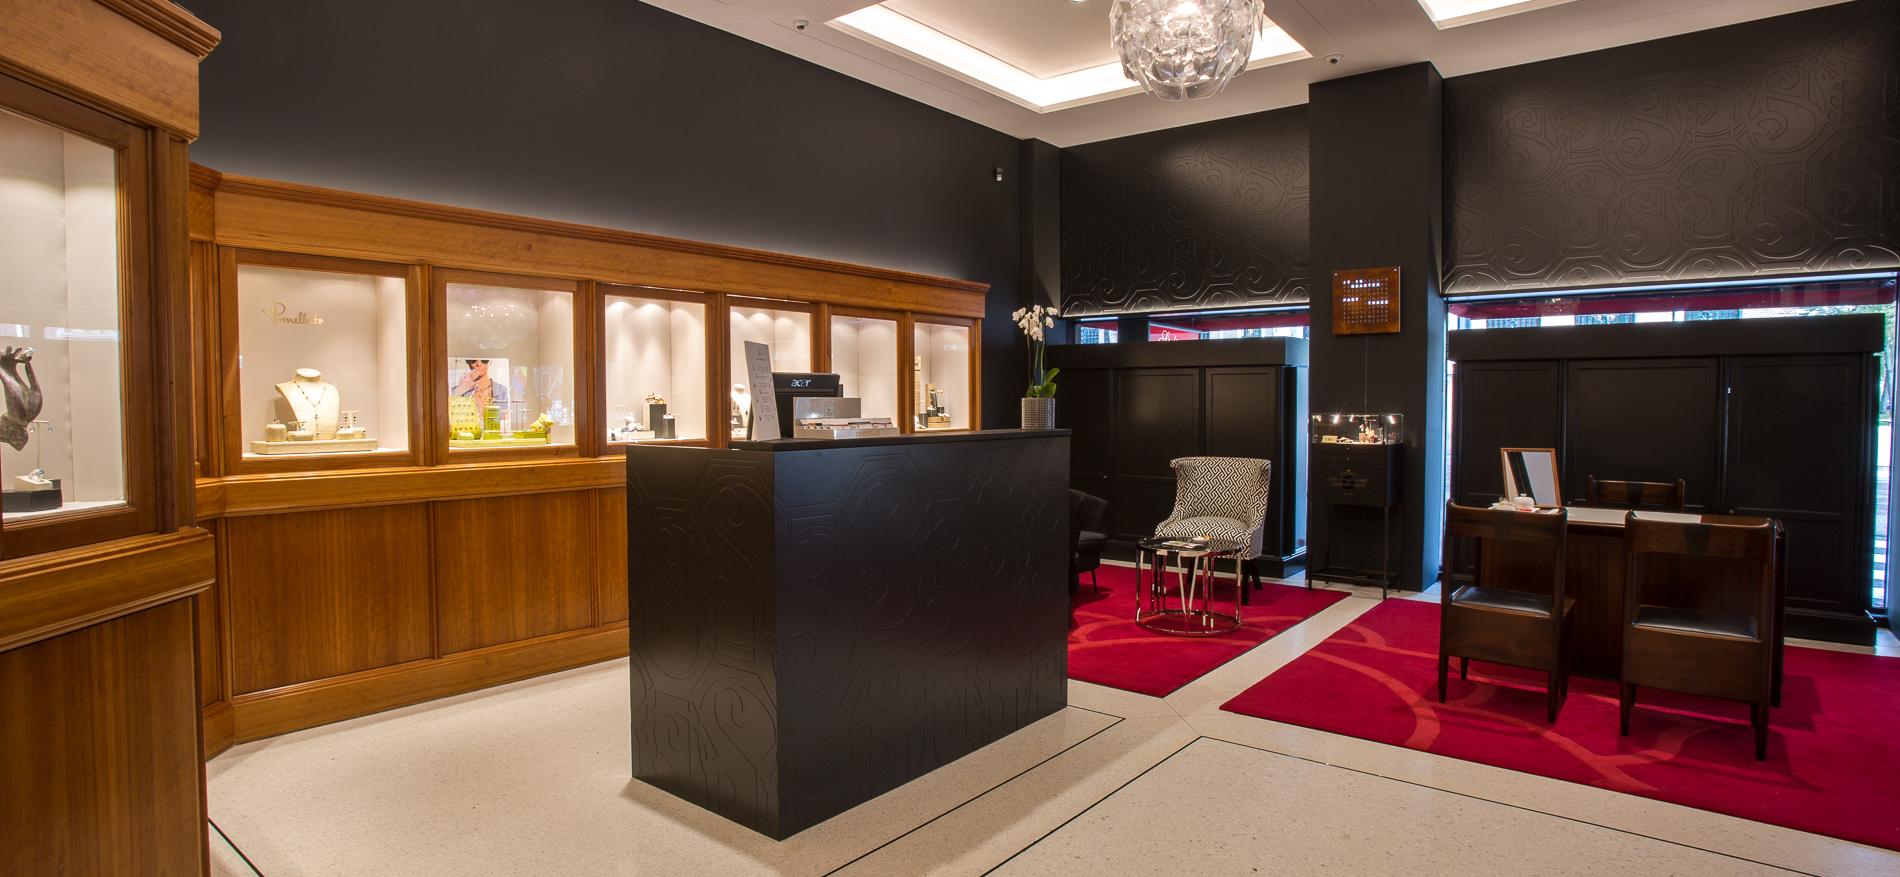 https://www.wsbinterieurbouw.nl/wp-content/uploads/2017/11/ontwerp-Interieur-Den-Haag-winkelinrichting-juwelier-QV1C5906.jpg